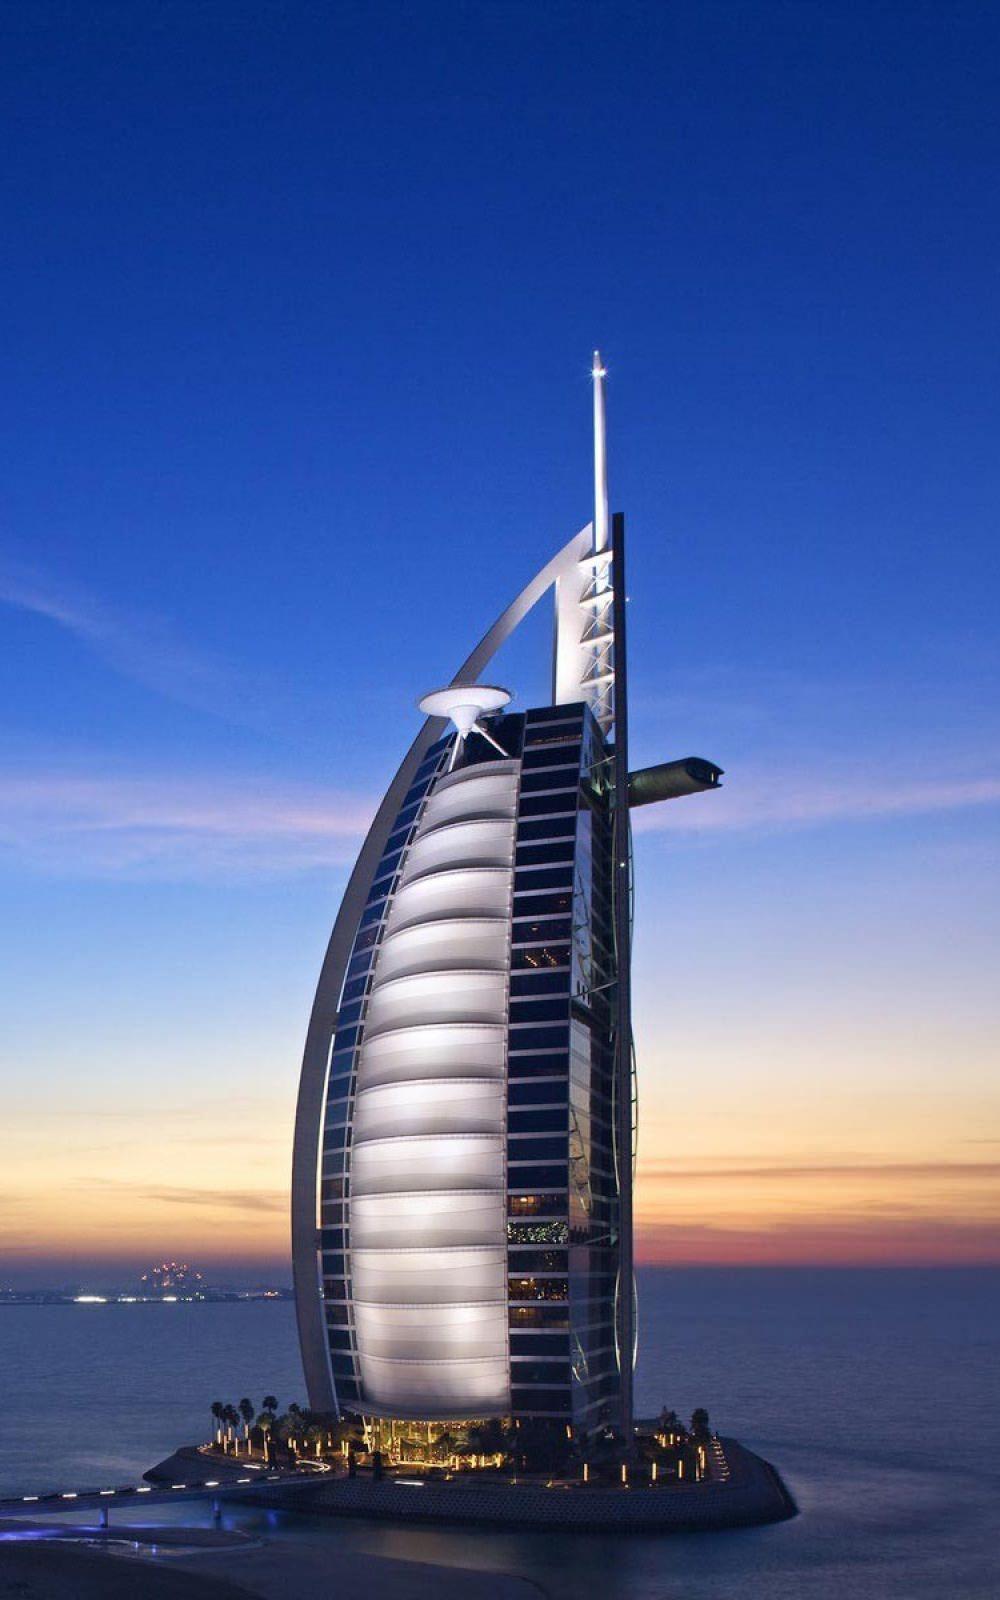 Burj Al Arab Wallpaper In 2019 Dubai Tower Burj Al Arab